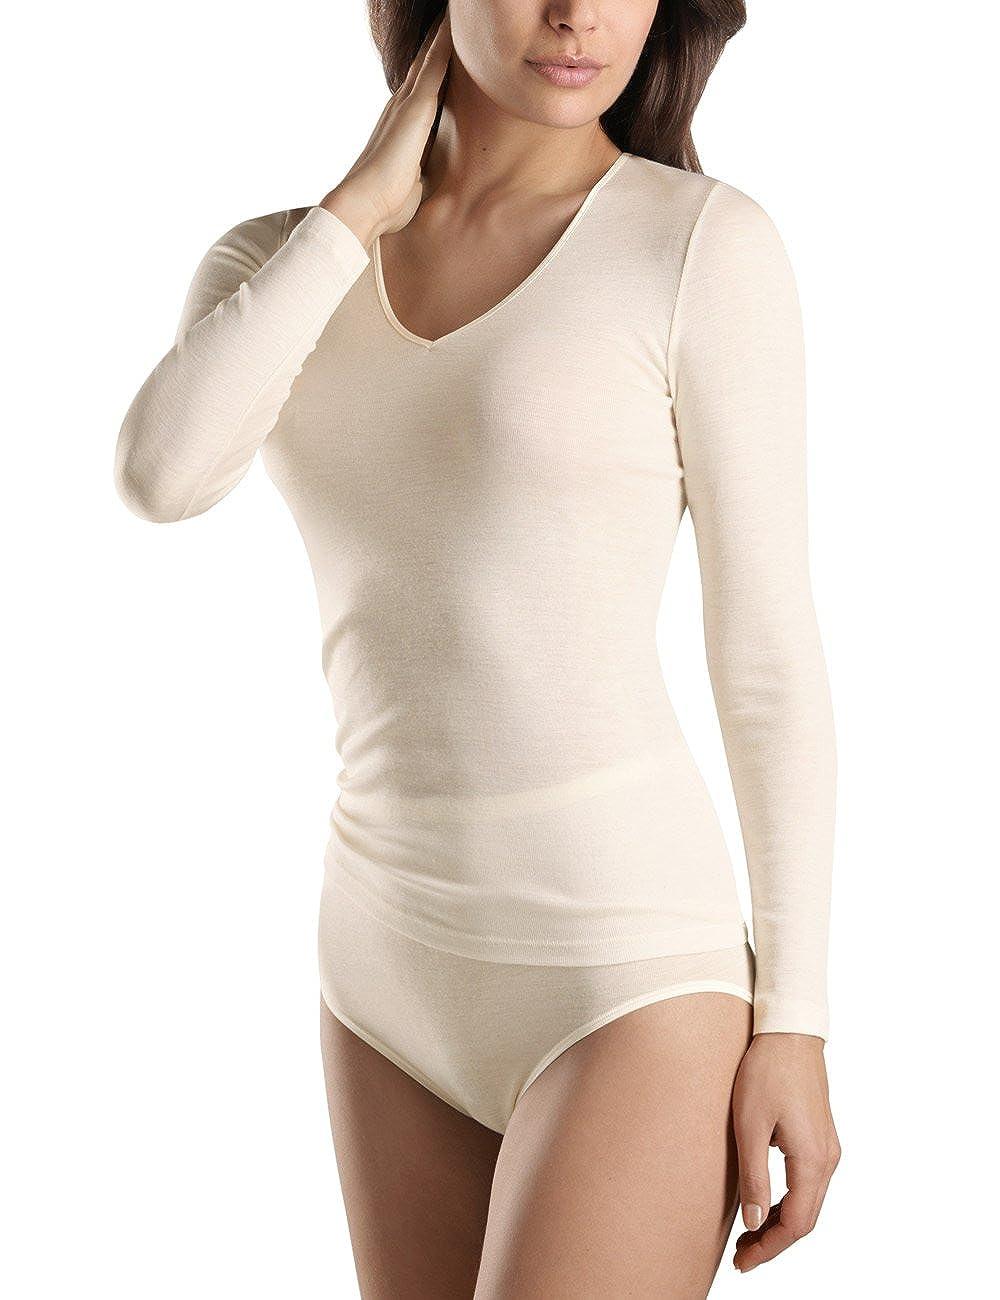 Women/'s HANRO Womens Woolen Silk W Long Sleeve Shirt 71418 HANRO Women/'s Woolen Silk W Long Sleeve Shirt 71418 Hanro USA Inc.